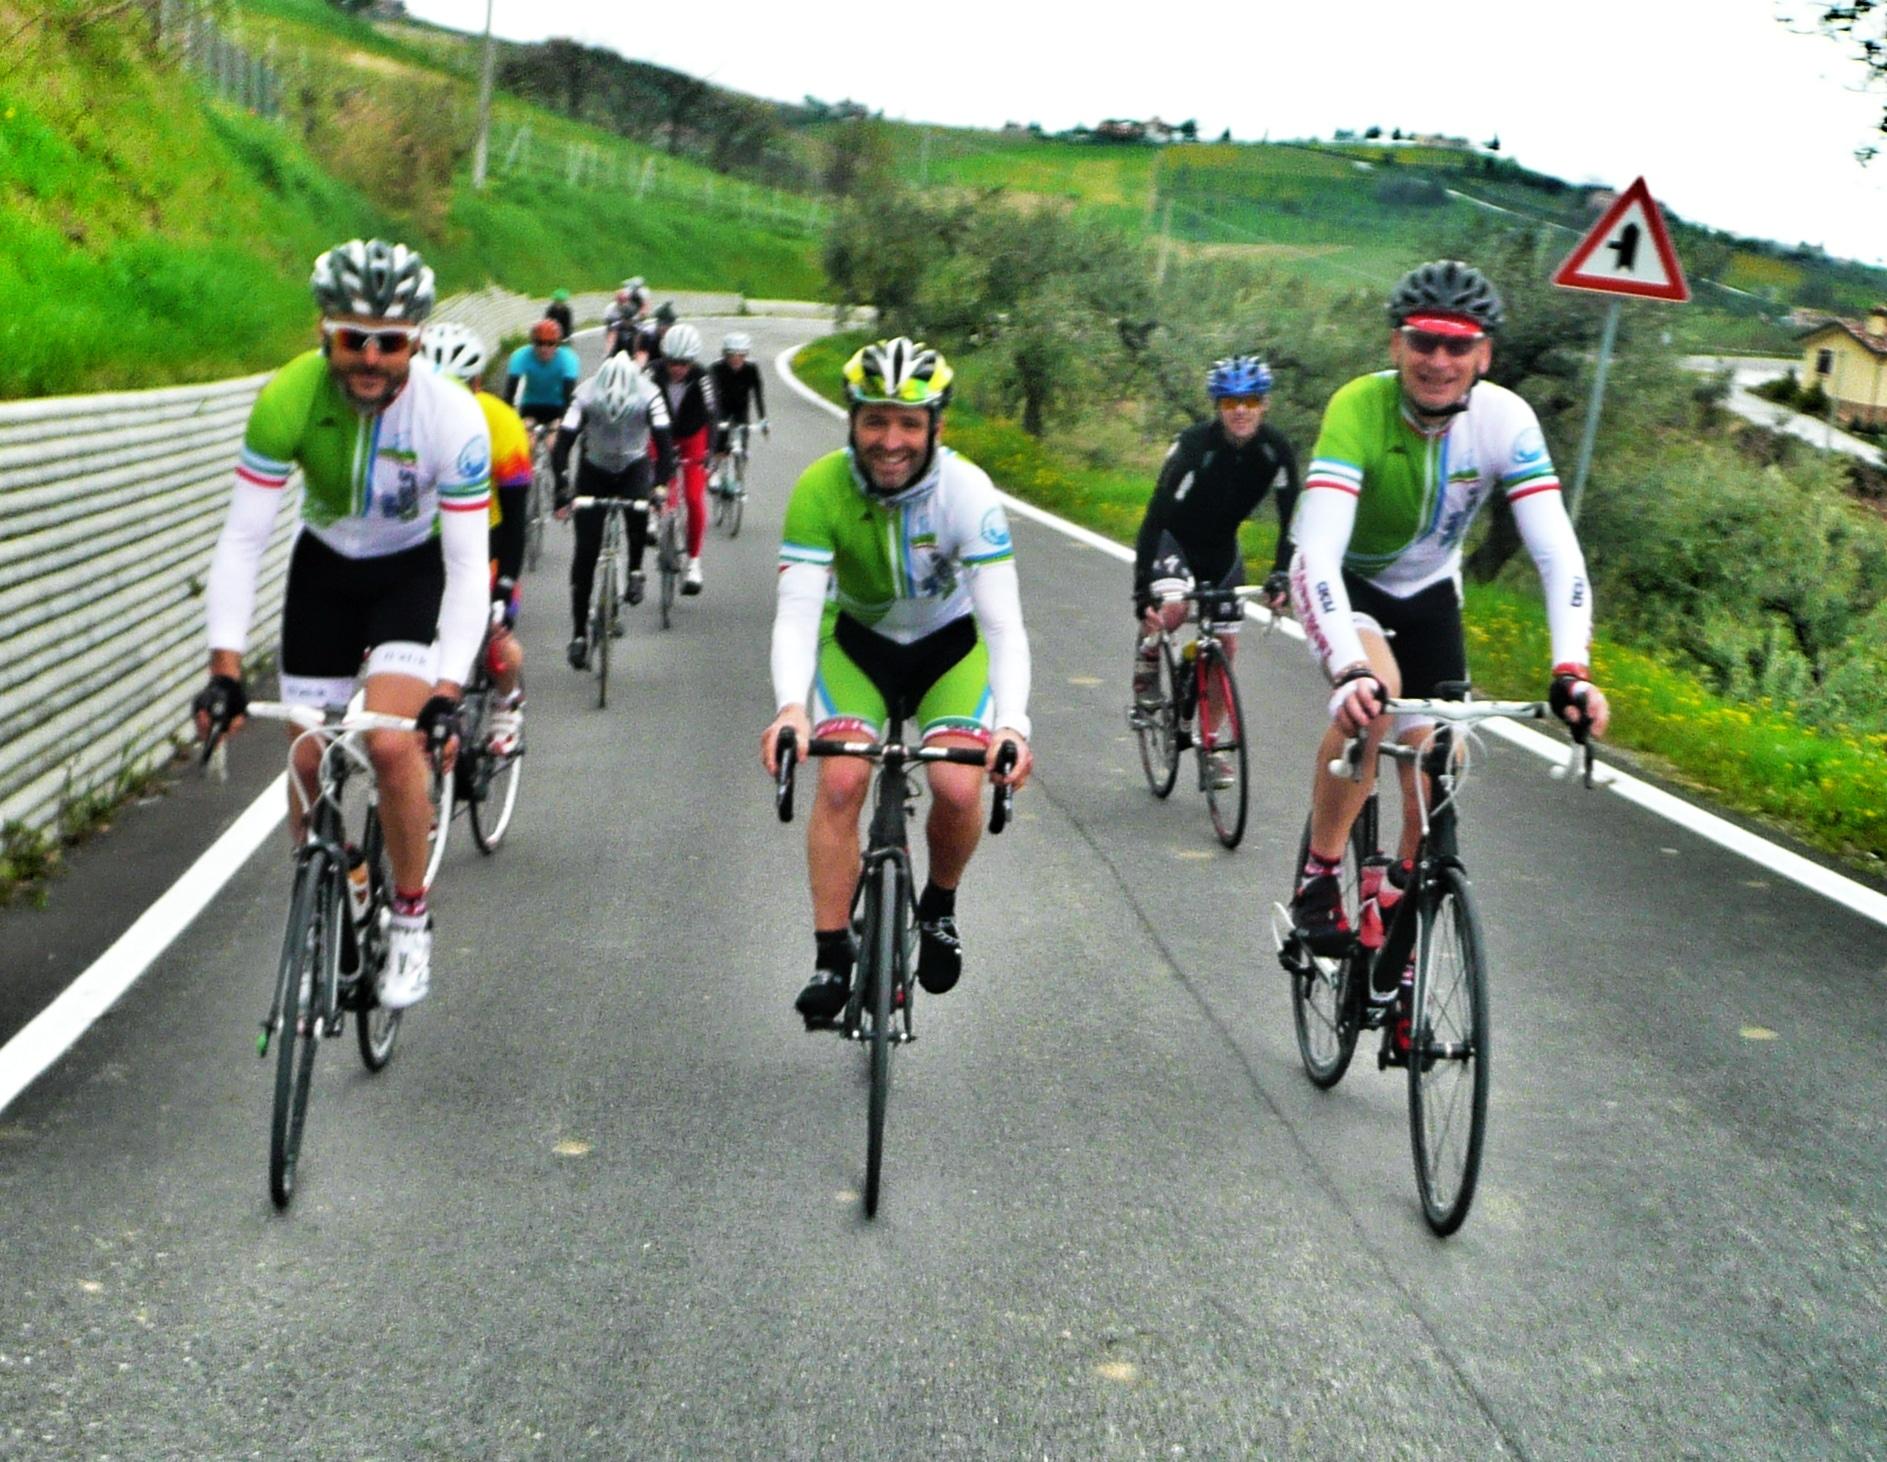 Andrea, Daniele et Ole: Drei Guides der Rimini Bike Hotels